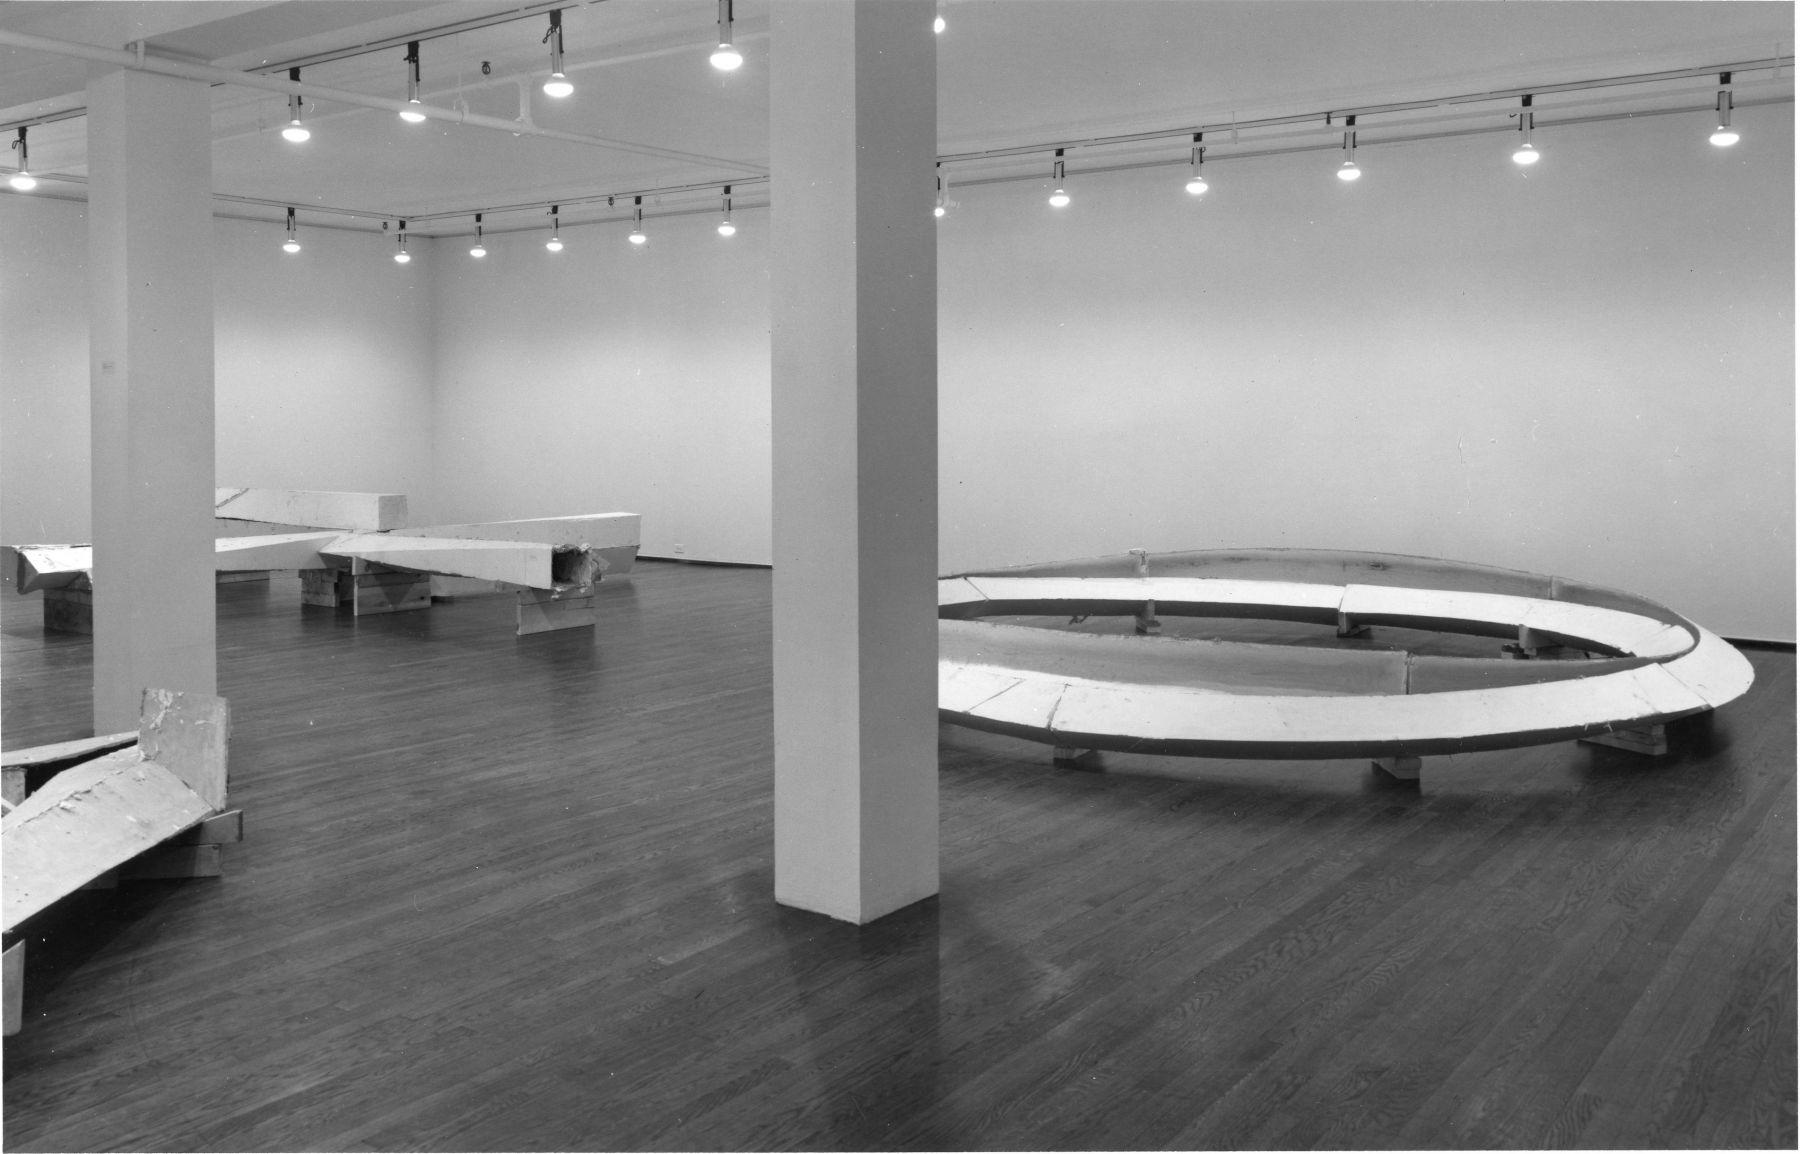 Installation view, Bruce Nauman, 420 WEST BROADWAY